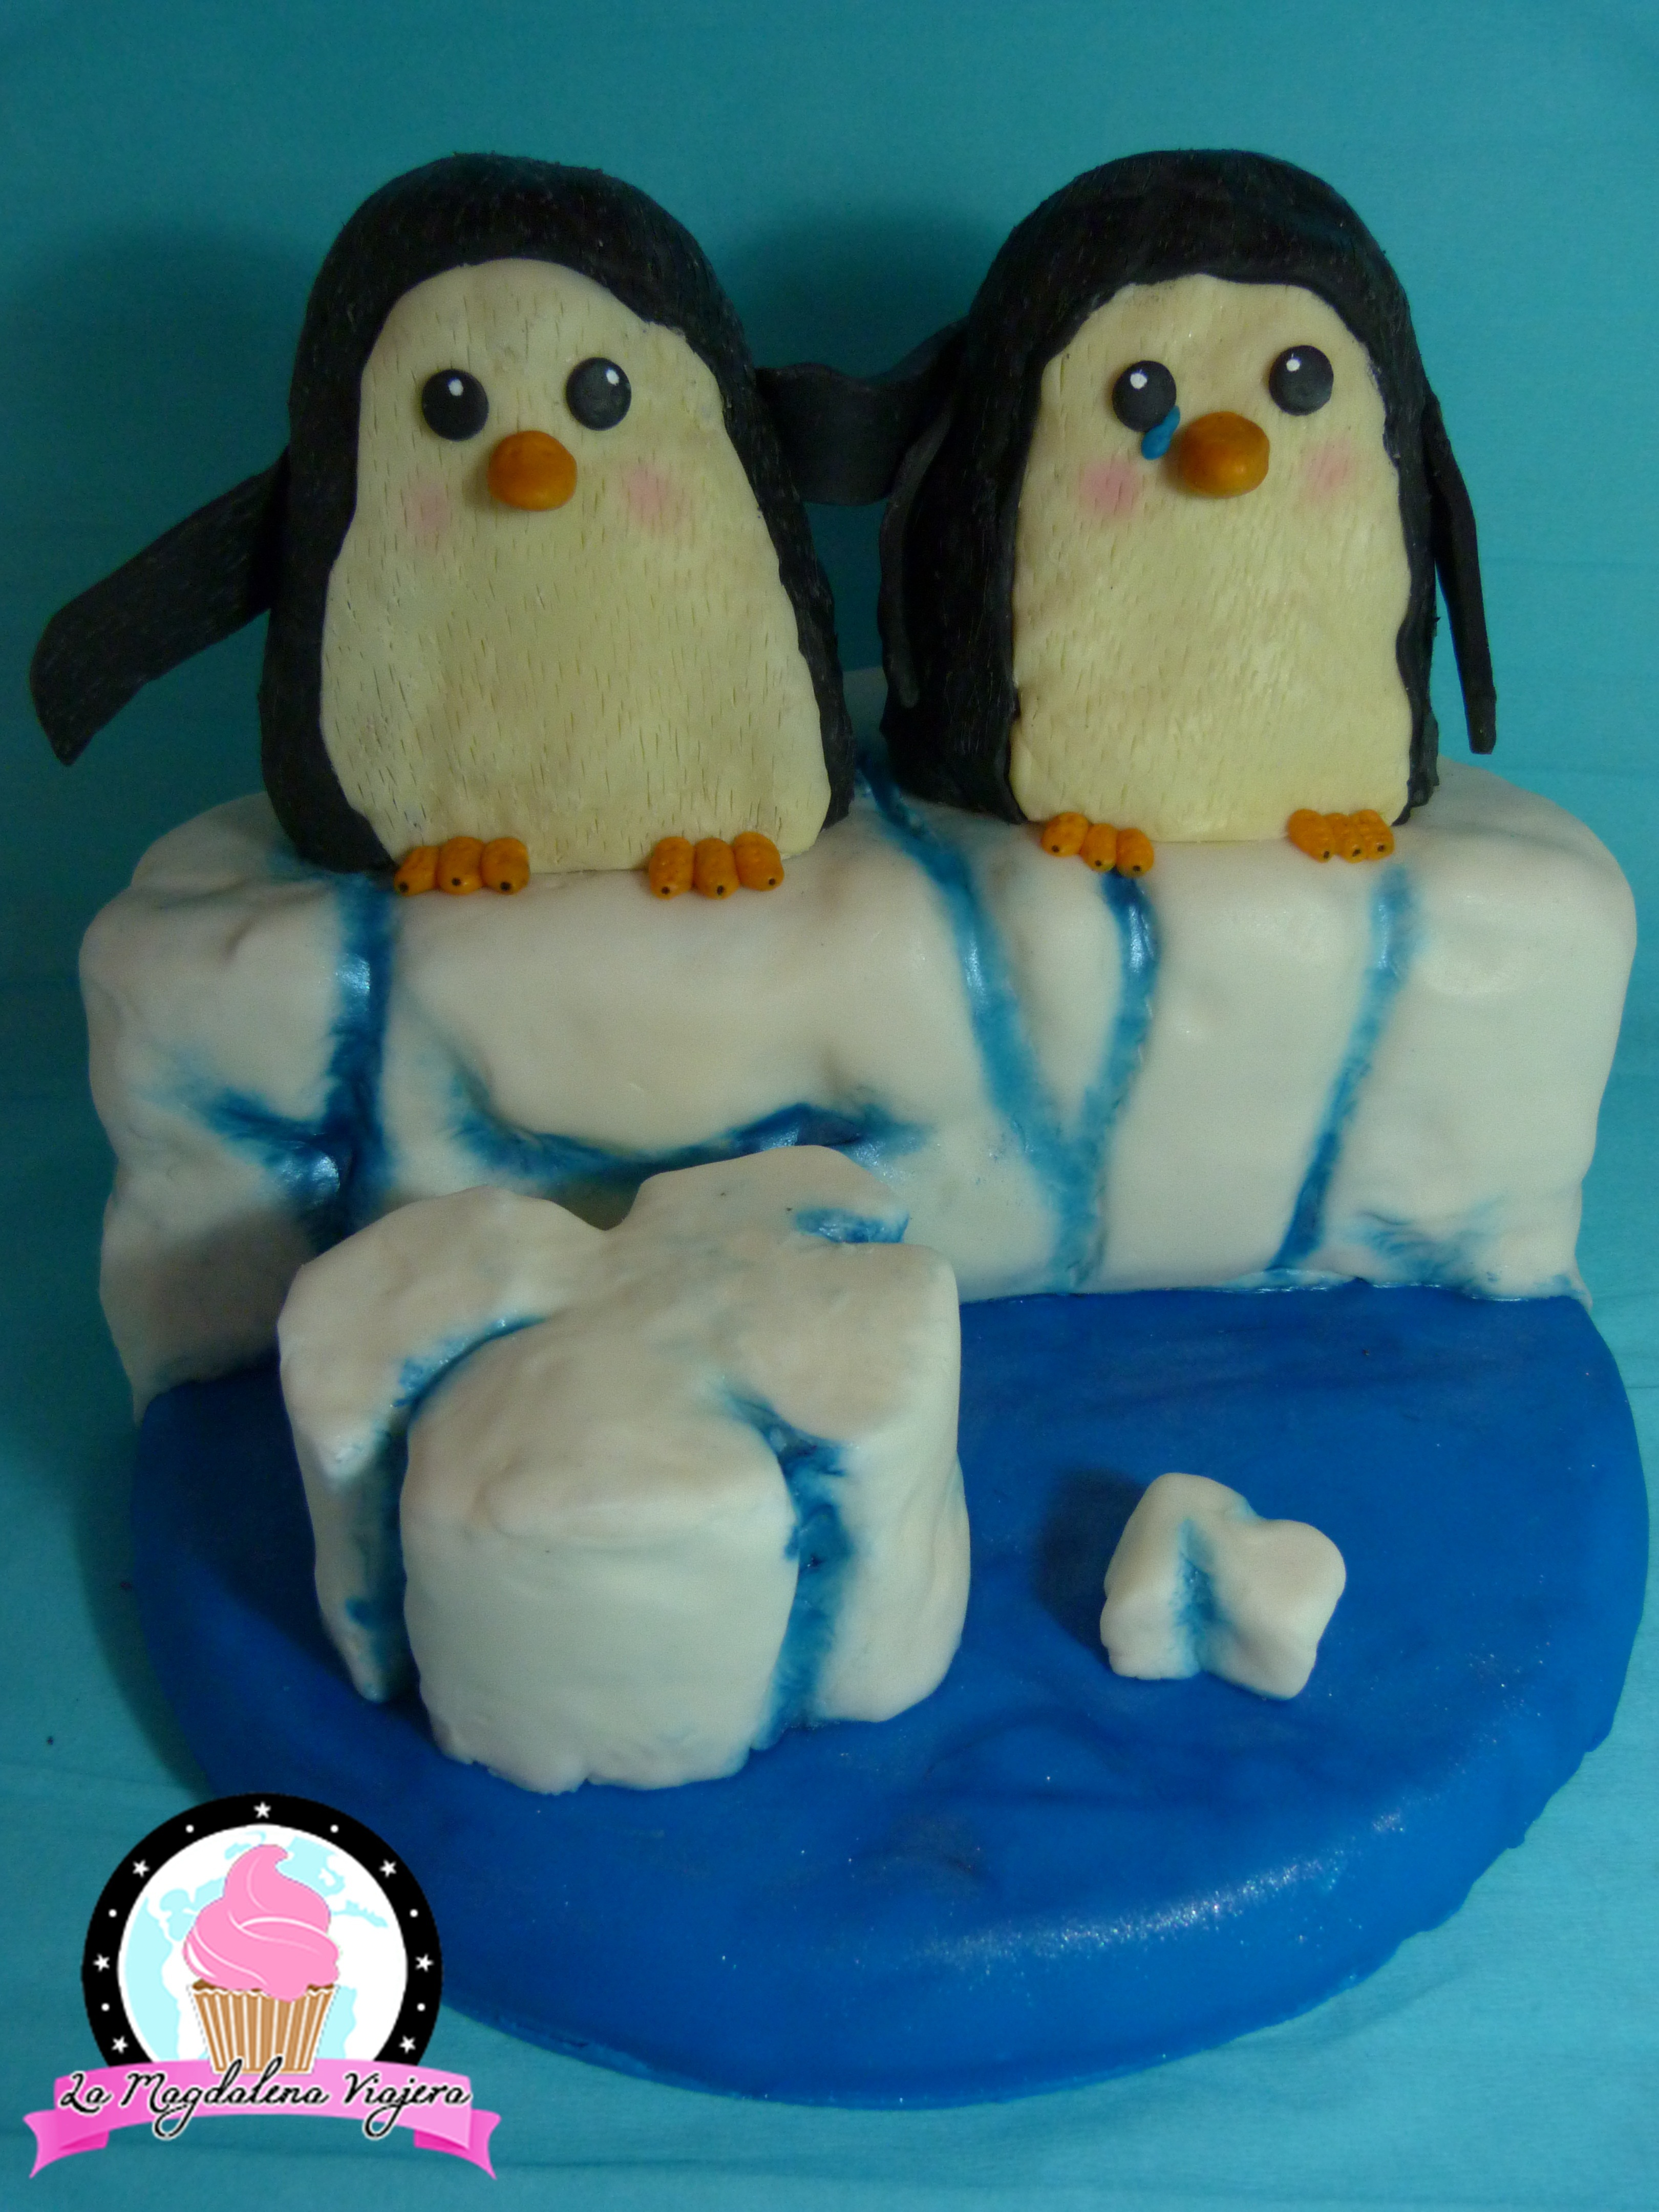 Animal-Rights-Sonia-Valverde-La-Magdalena-Viajera-Penguin.jpg#asset:13738